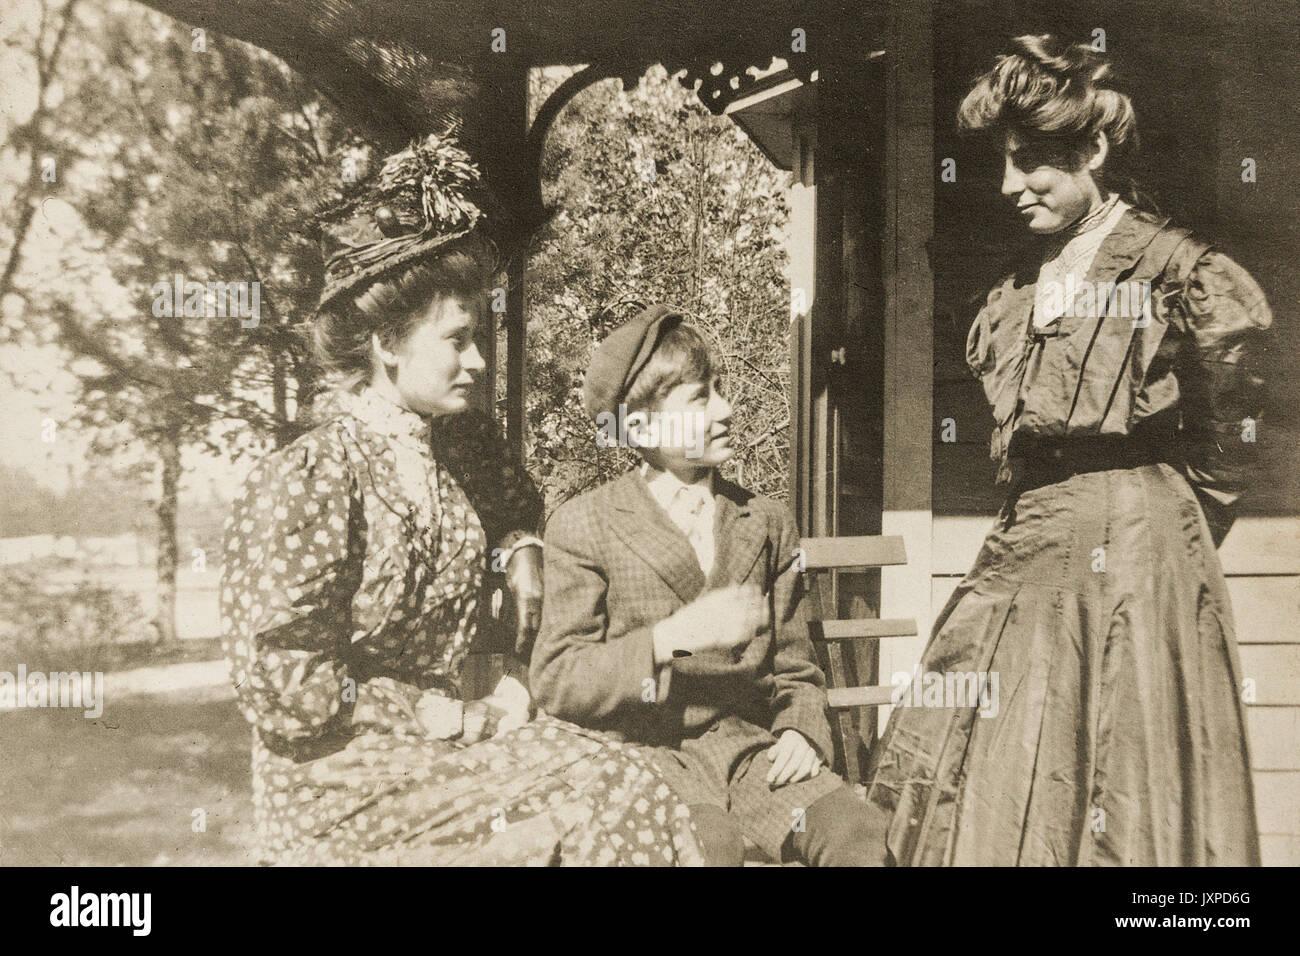 Scenes from Minnesota 1907-1908 Stock Photo